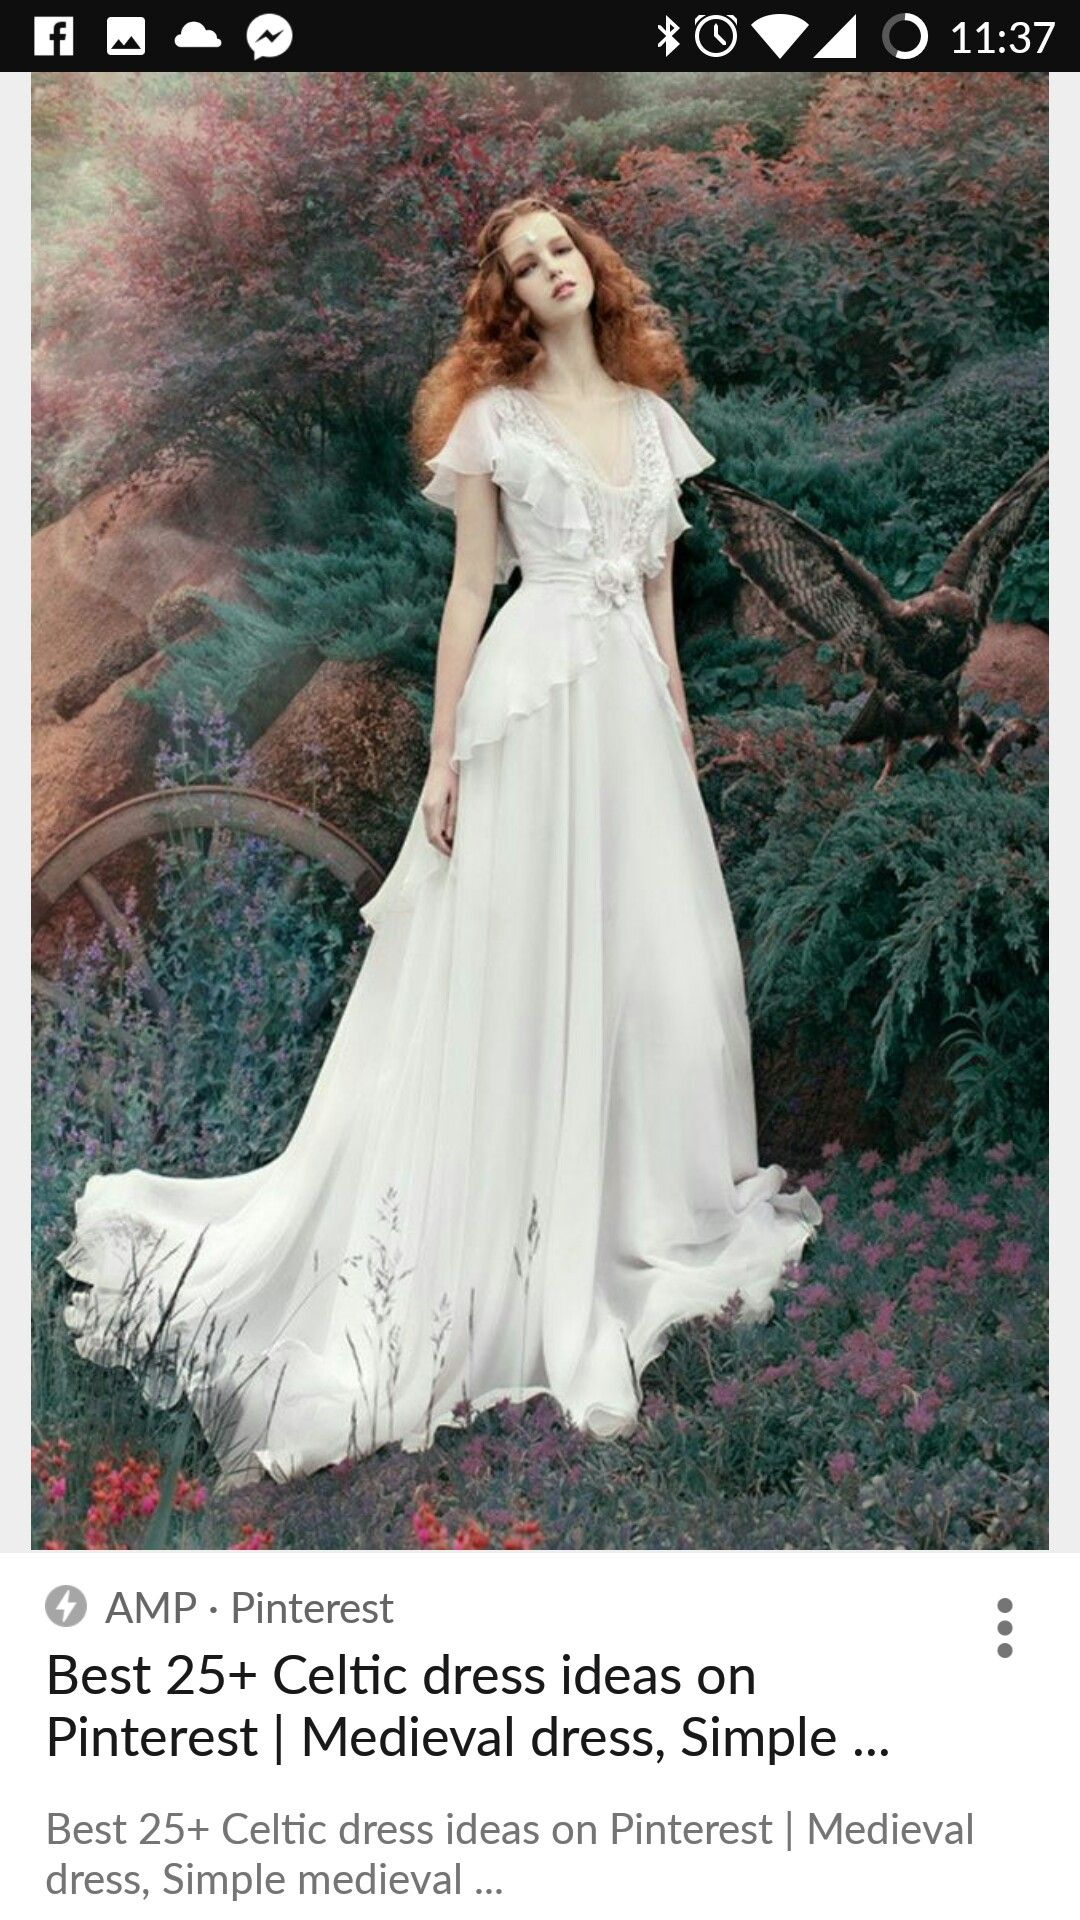 Scottish wedding dresses  Pin by Jaimee Gabriel on wedding ideas  Pinterest  Wedding